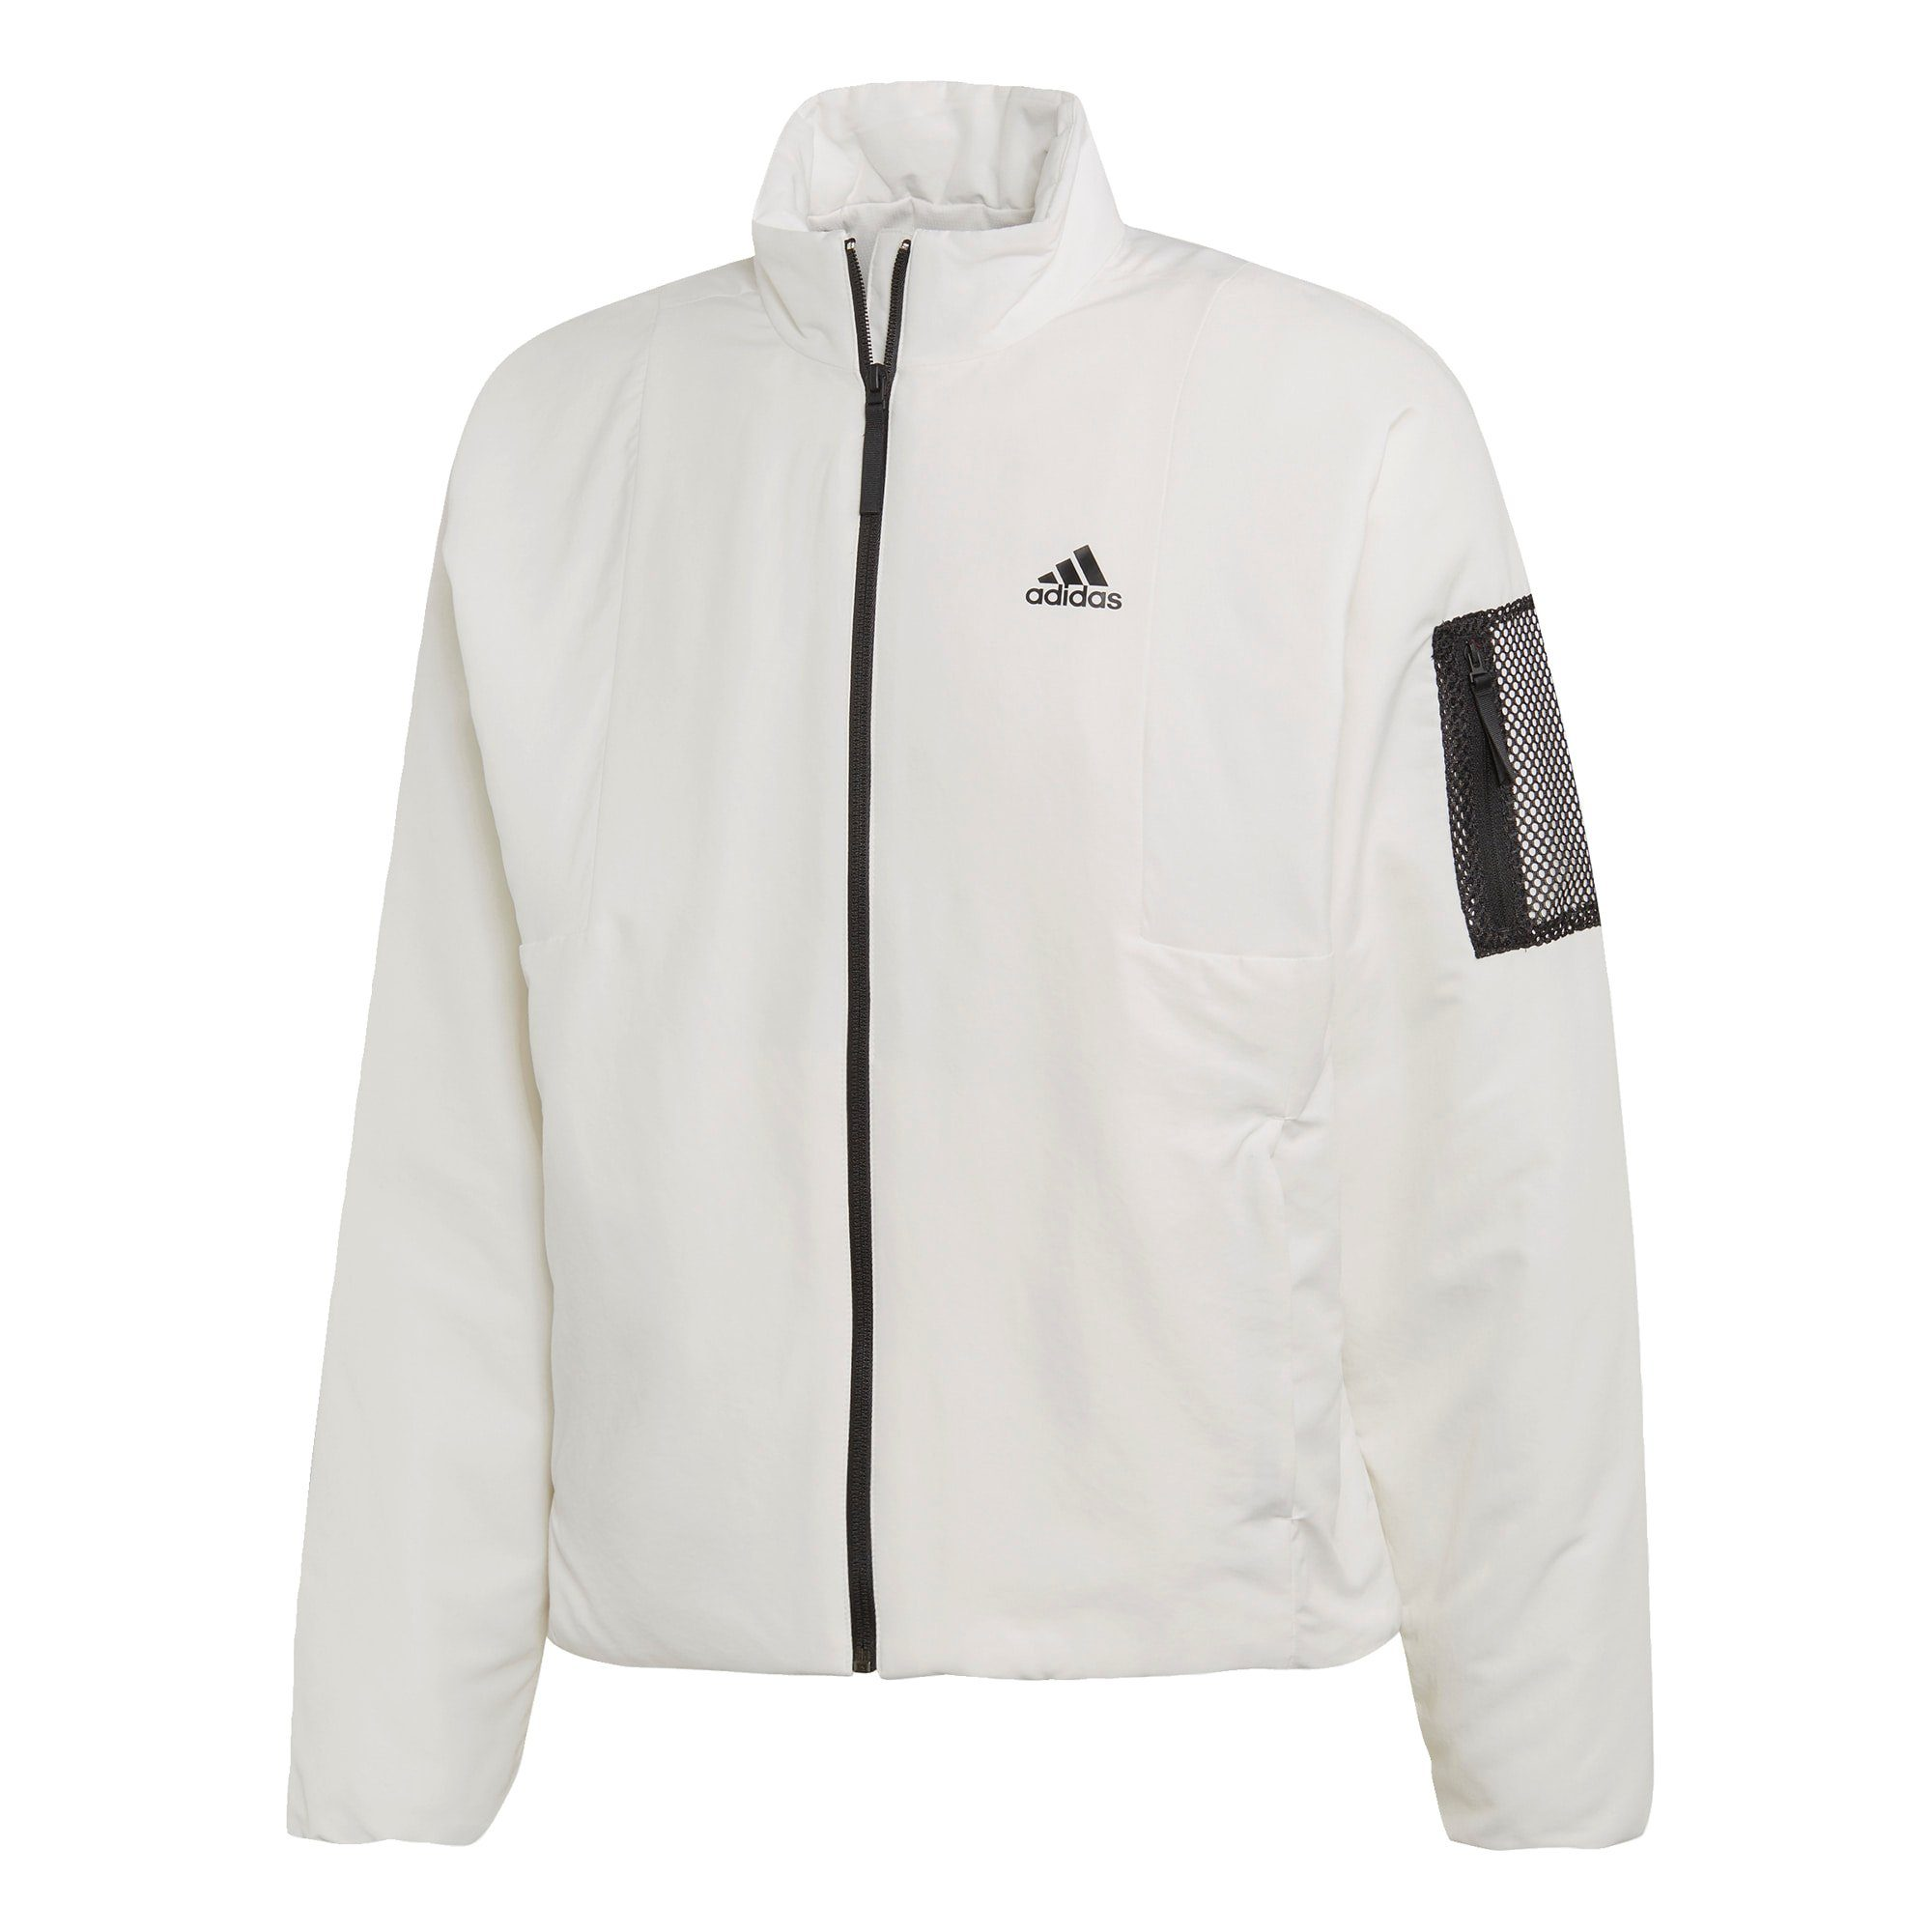 adidas Performance Funktionsjacke »Back to Sport Lined Insulation Jacke« online kaufen | OTTO